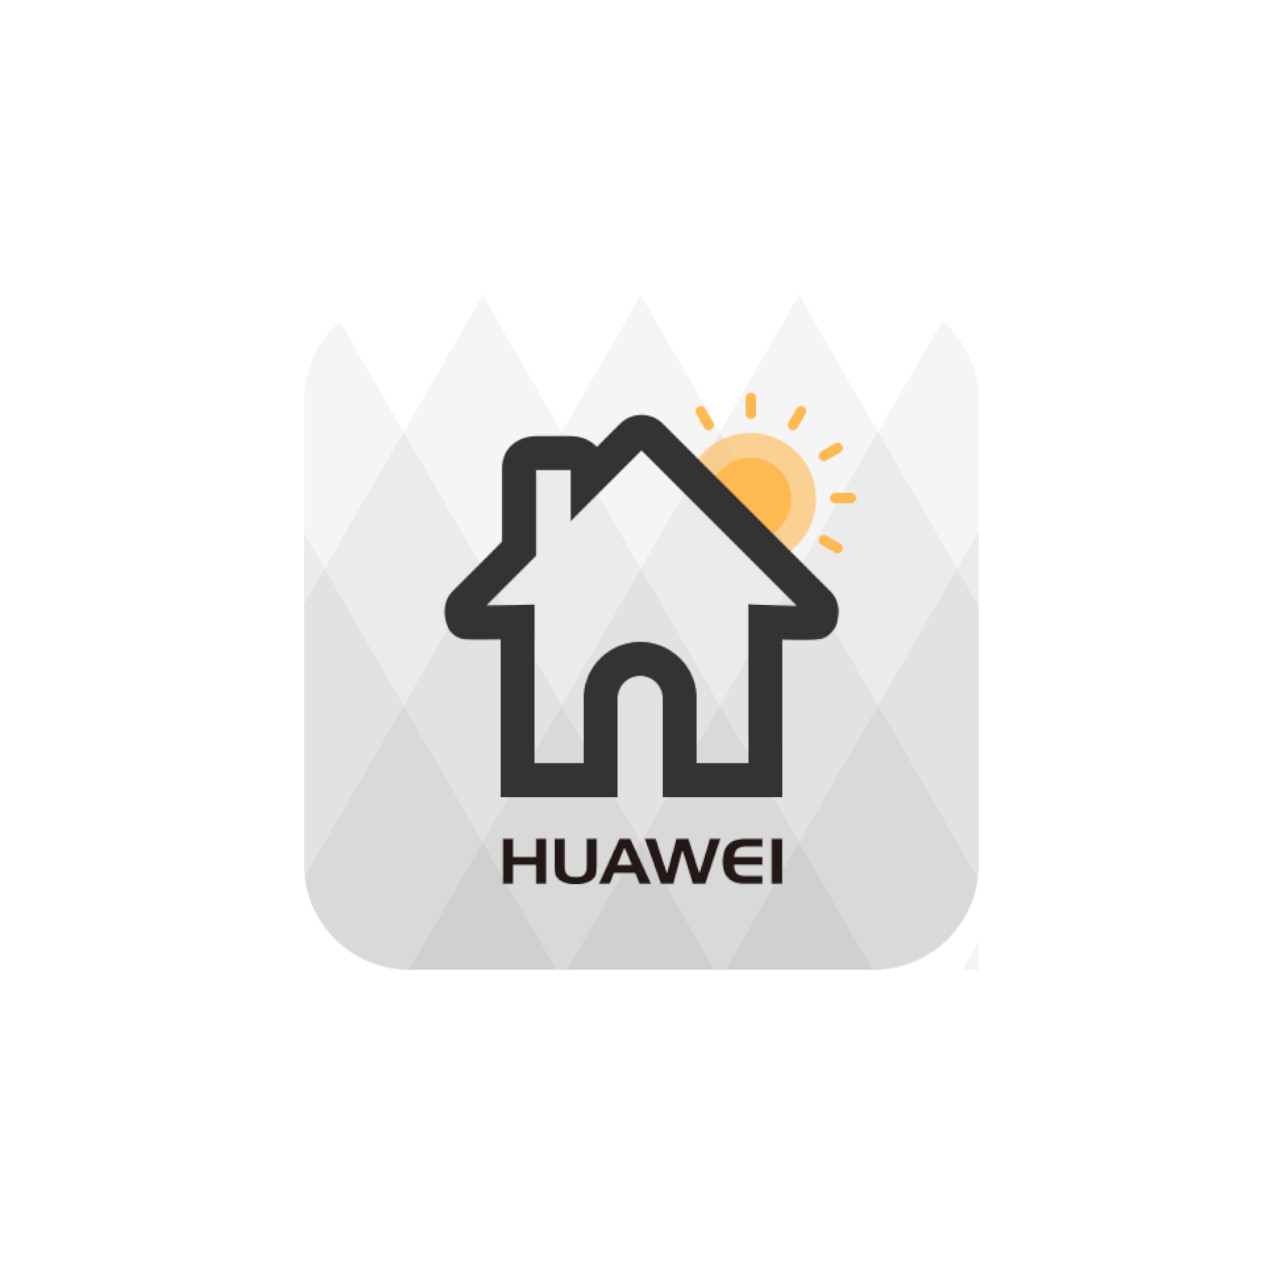 Huawei – FusionHome App Installation